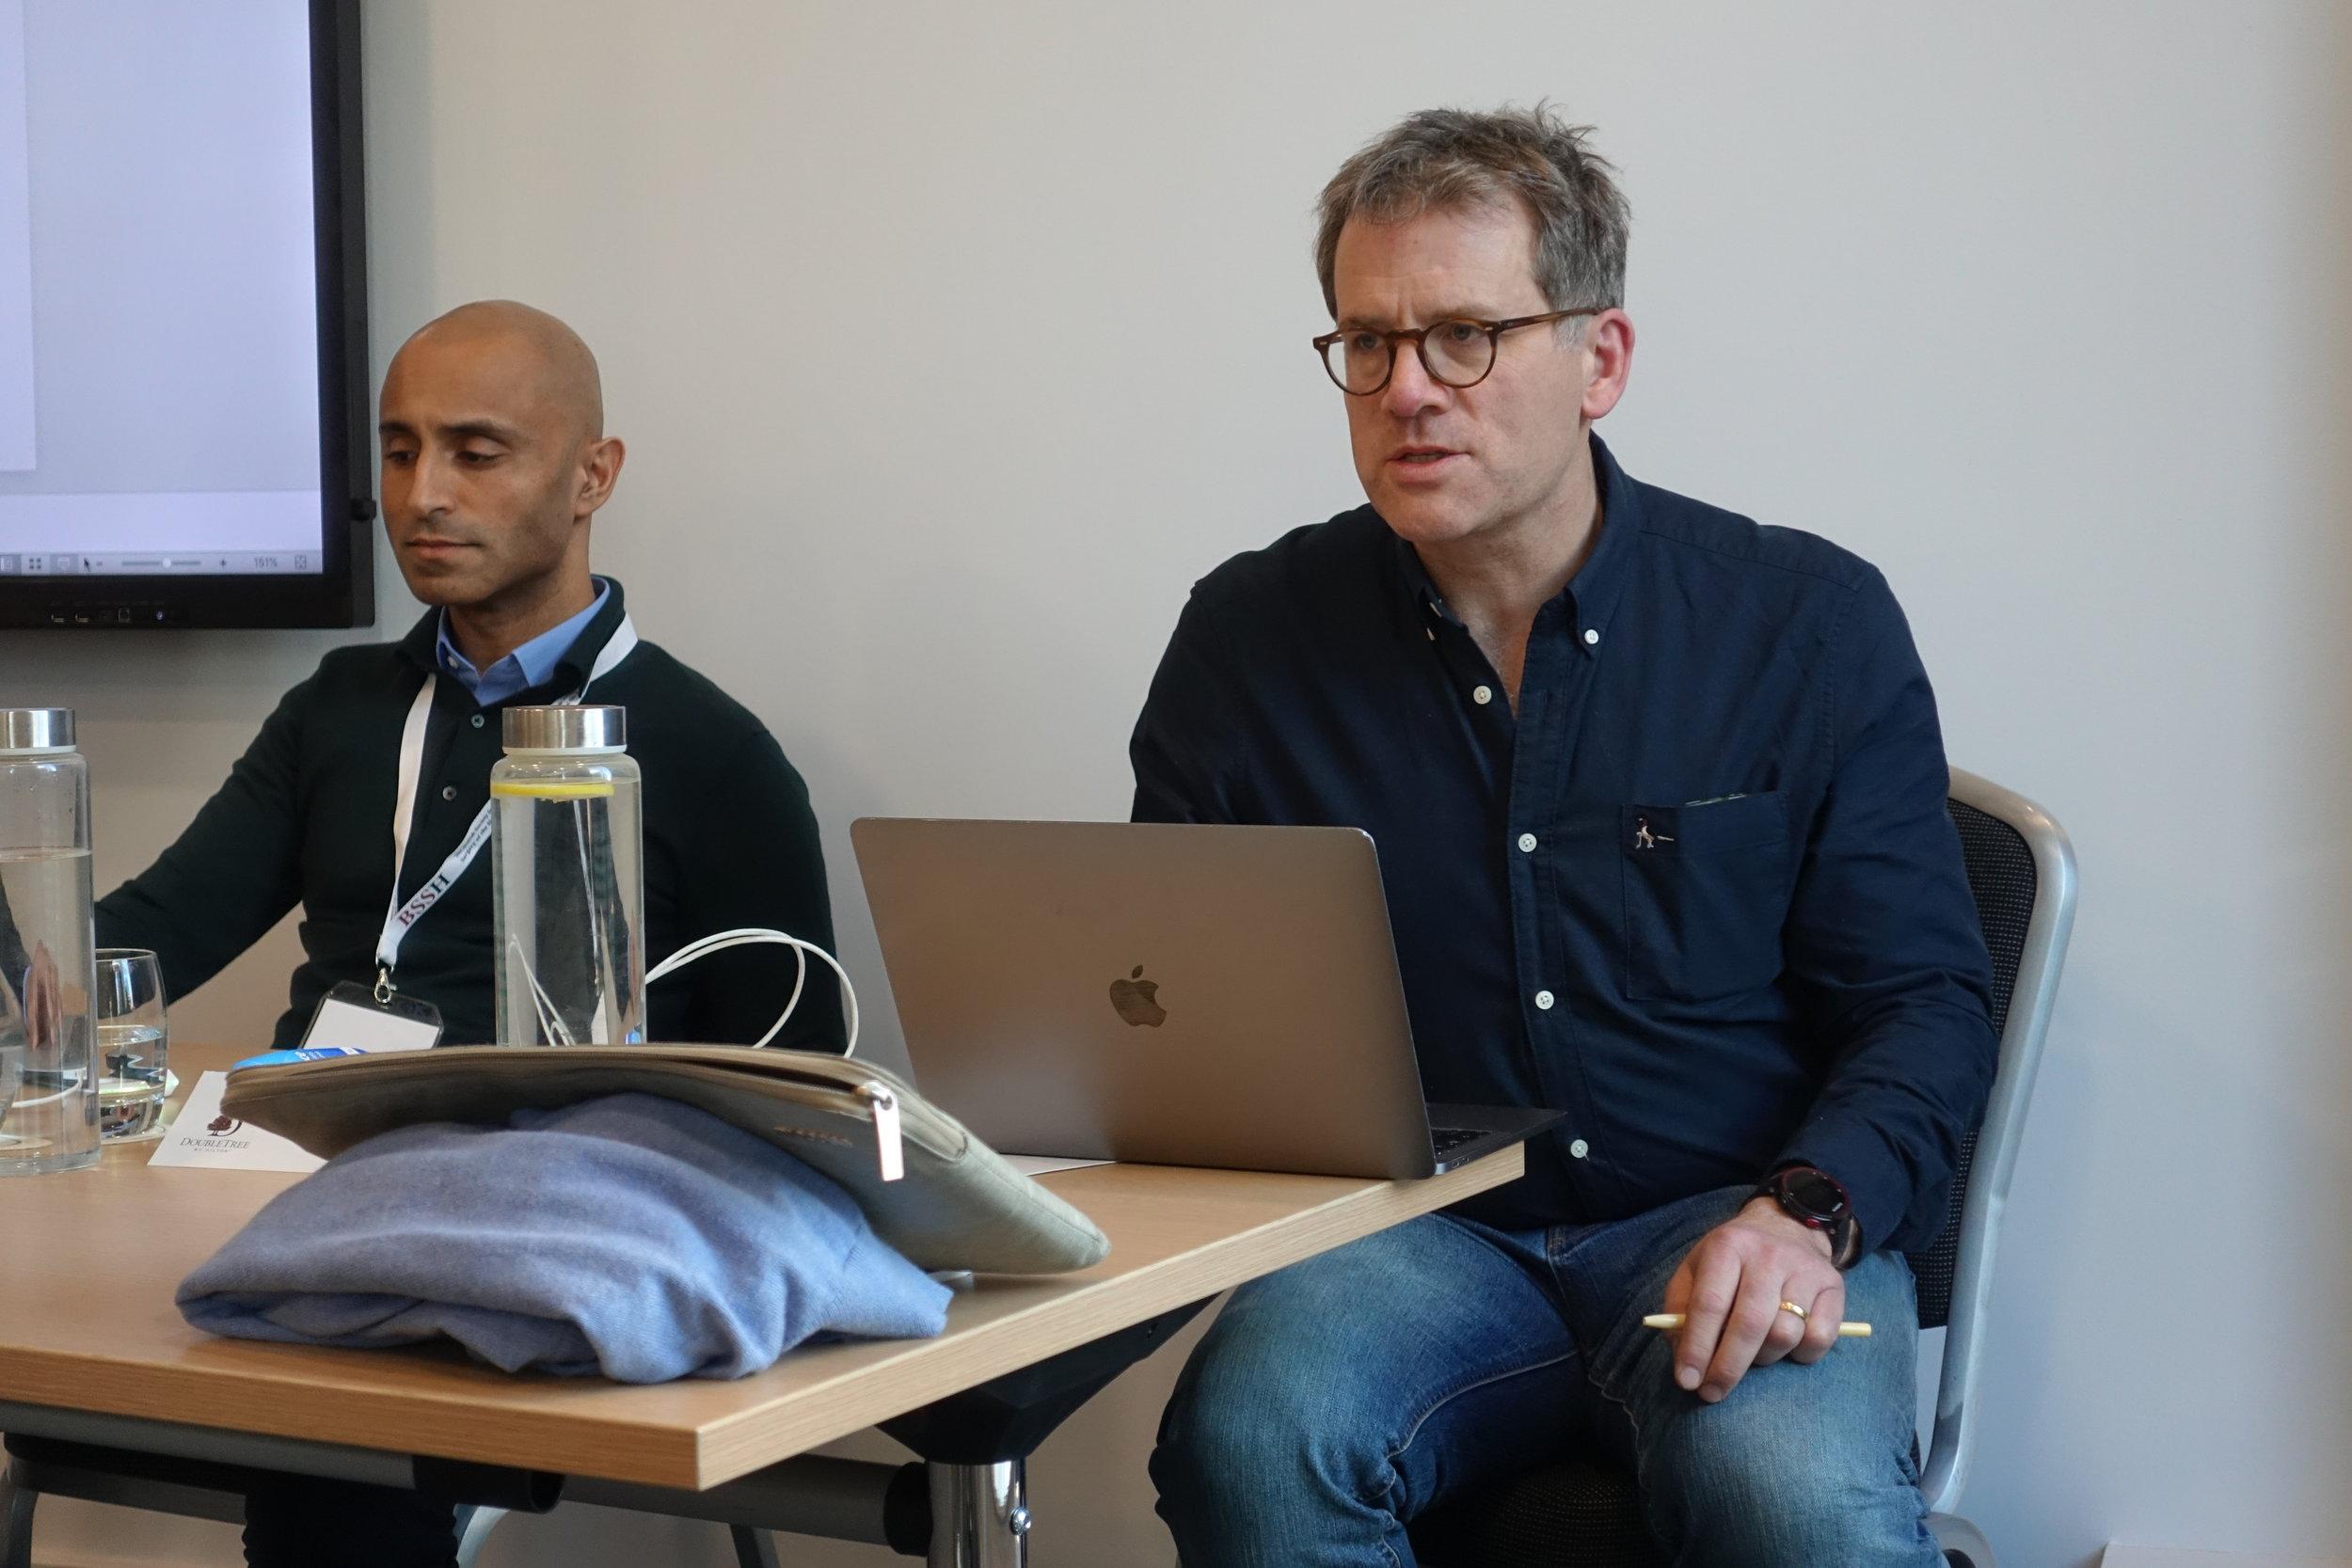 Mr Bran Sivakumar and Dr Frederik Verstreken